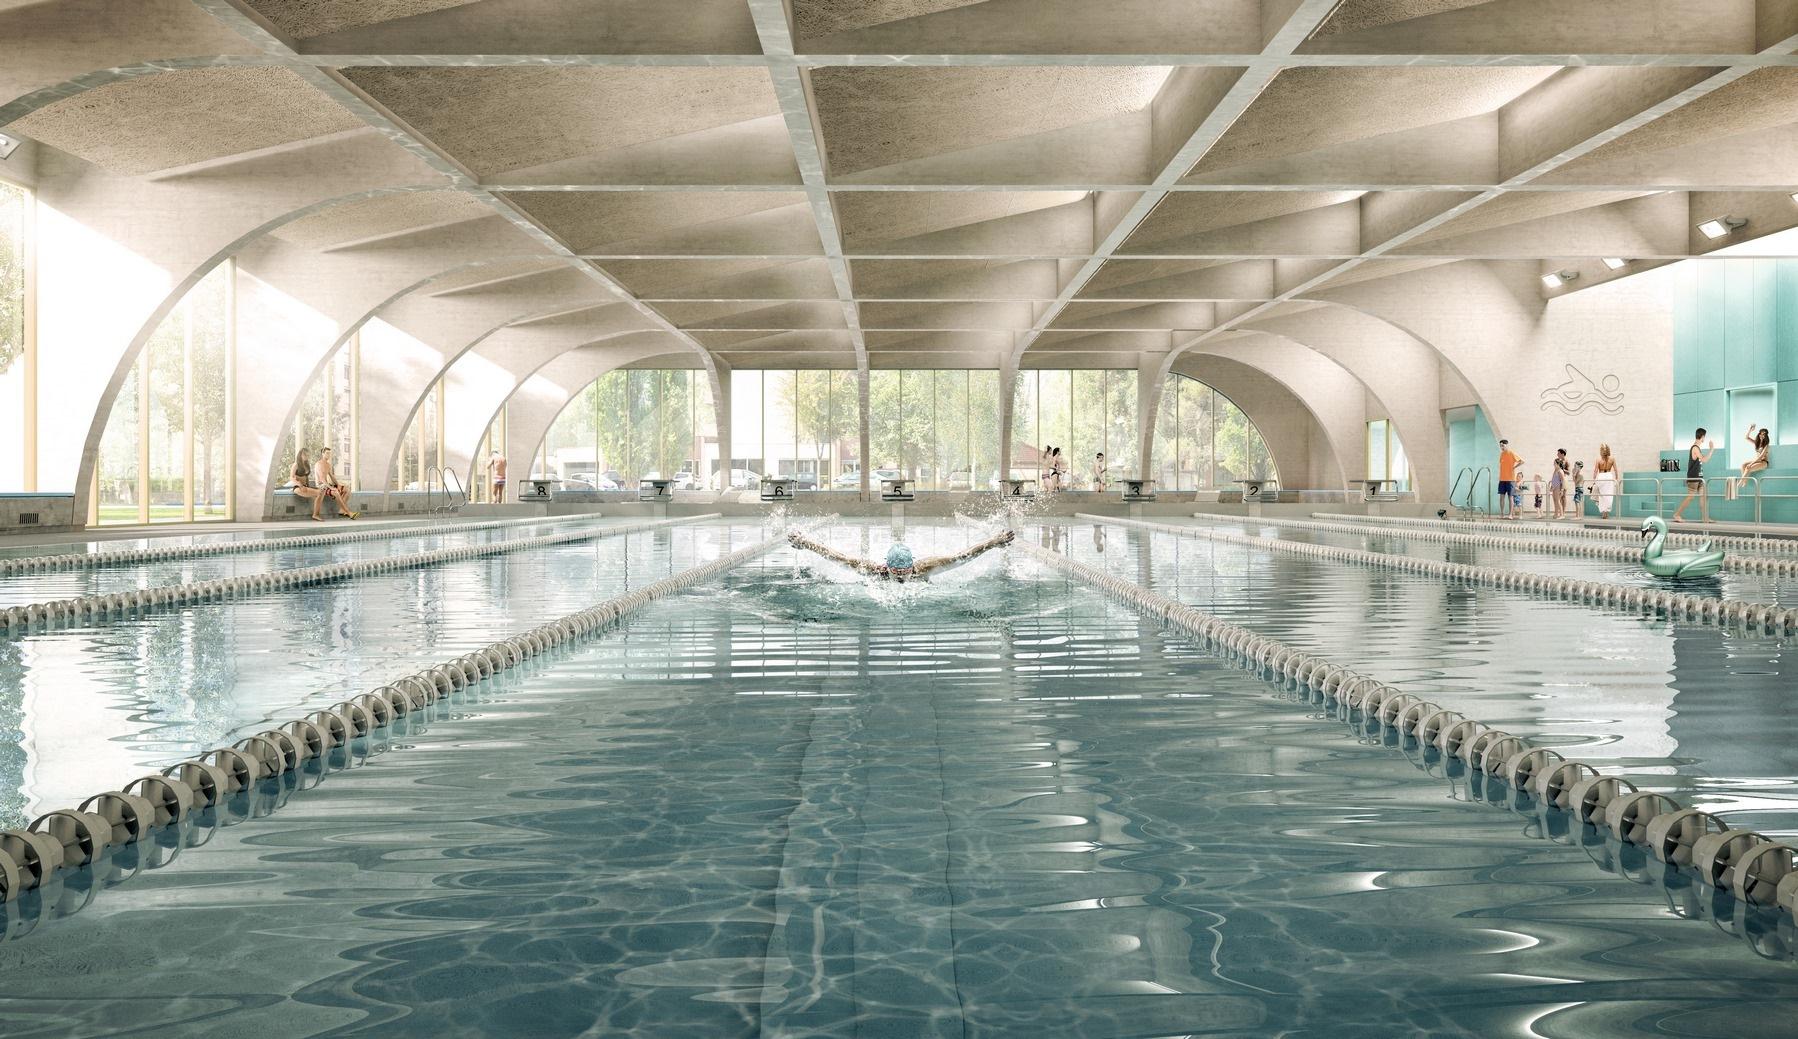 Piscine - Bourgoin-Jallieu (38) - Z Architecture concernant Piscine Bourgoin Jallieu